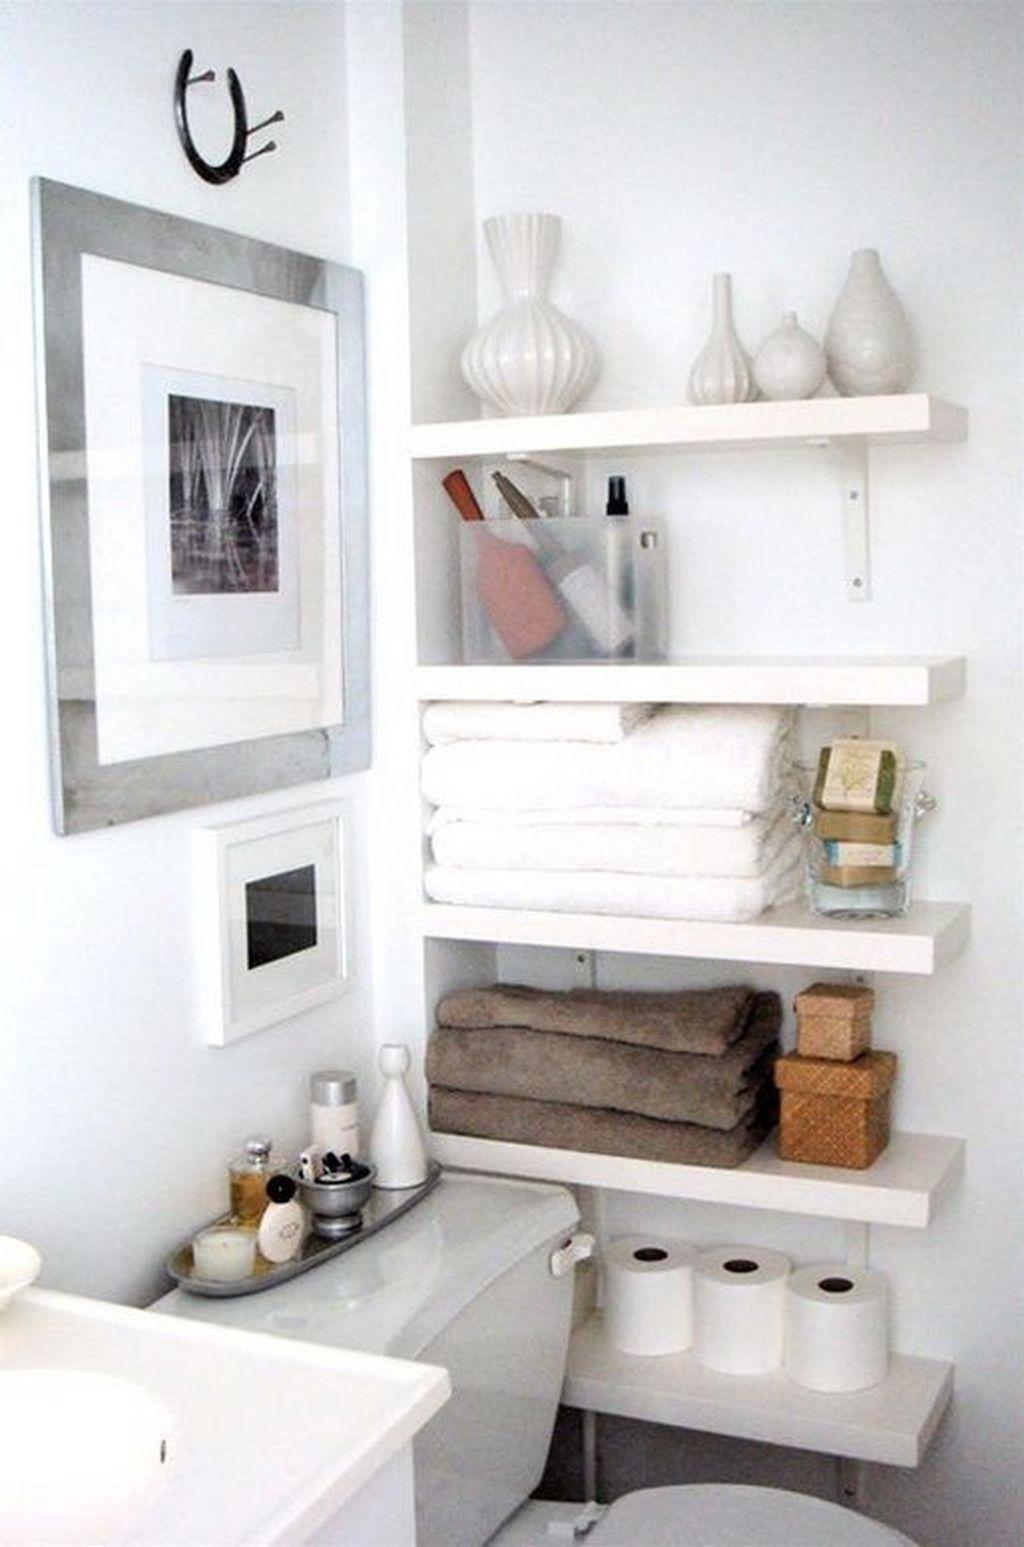 65 Easy Tips Small Bathroom Organization and Storage Ideas ...